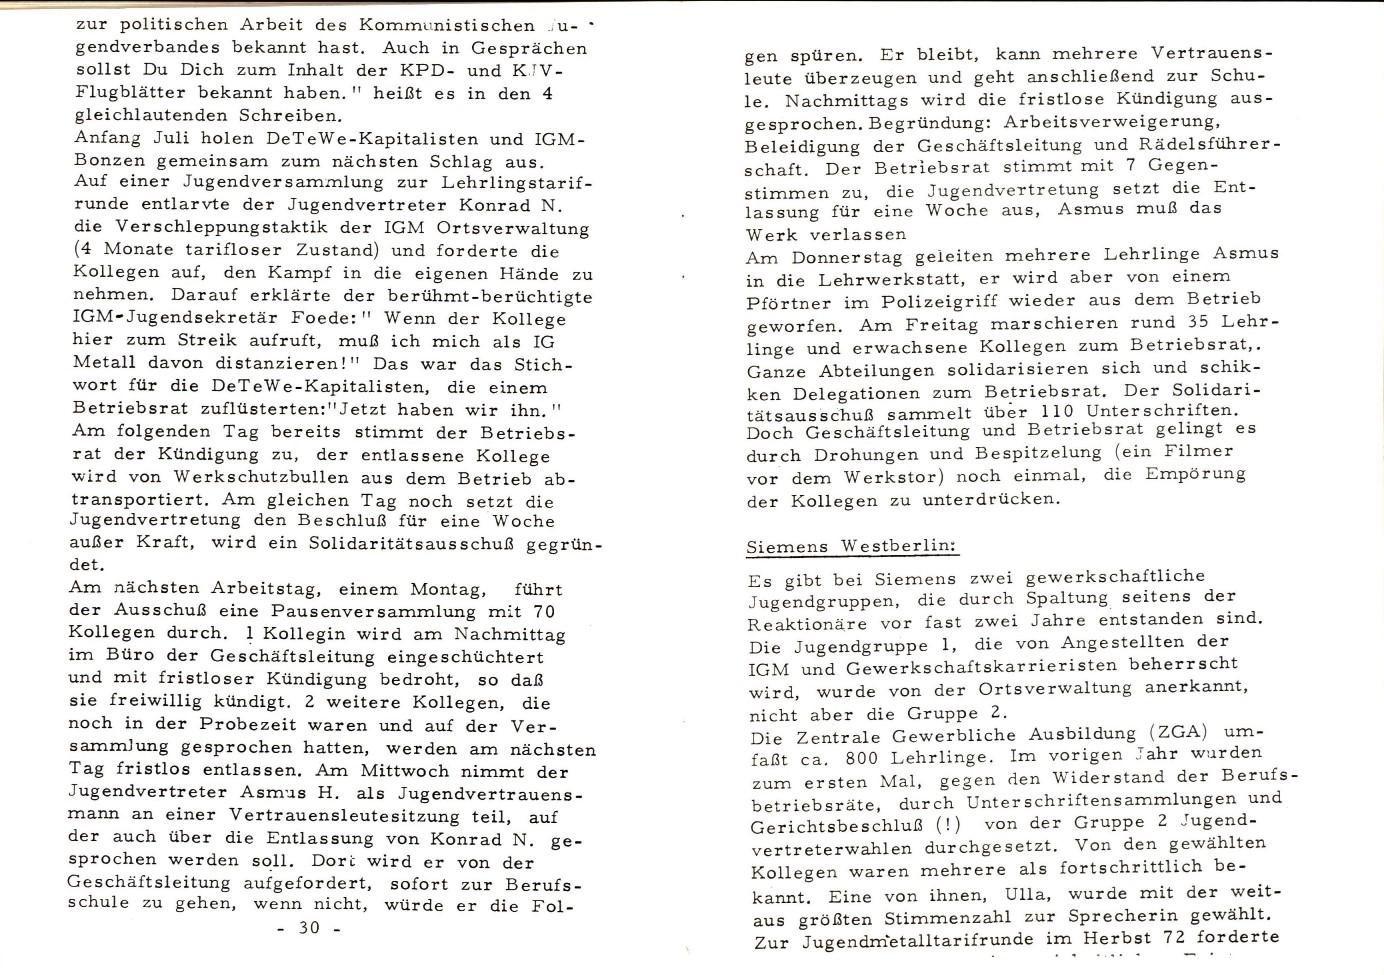 KJV_1973_NK_Arbeiterjugend_17